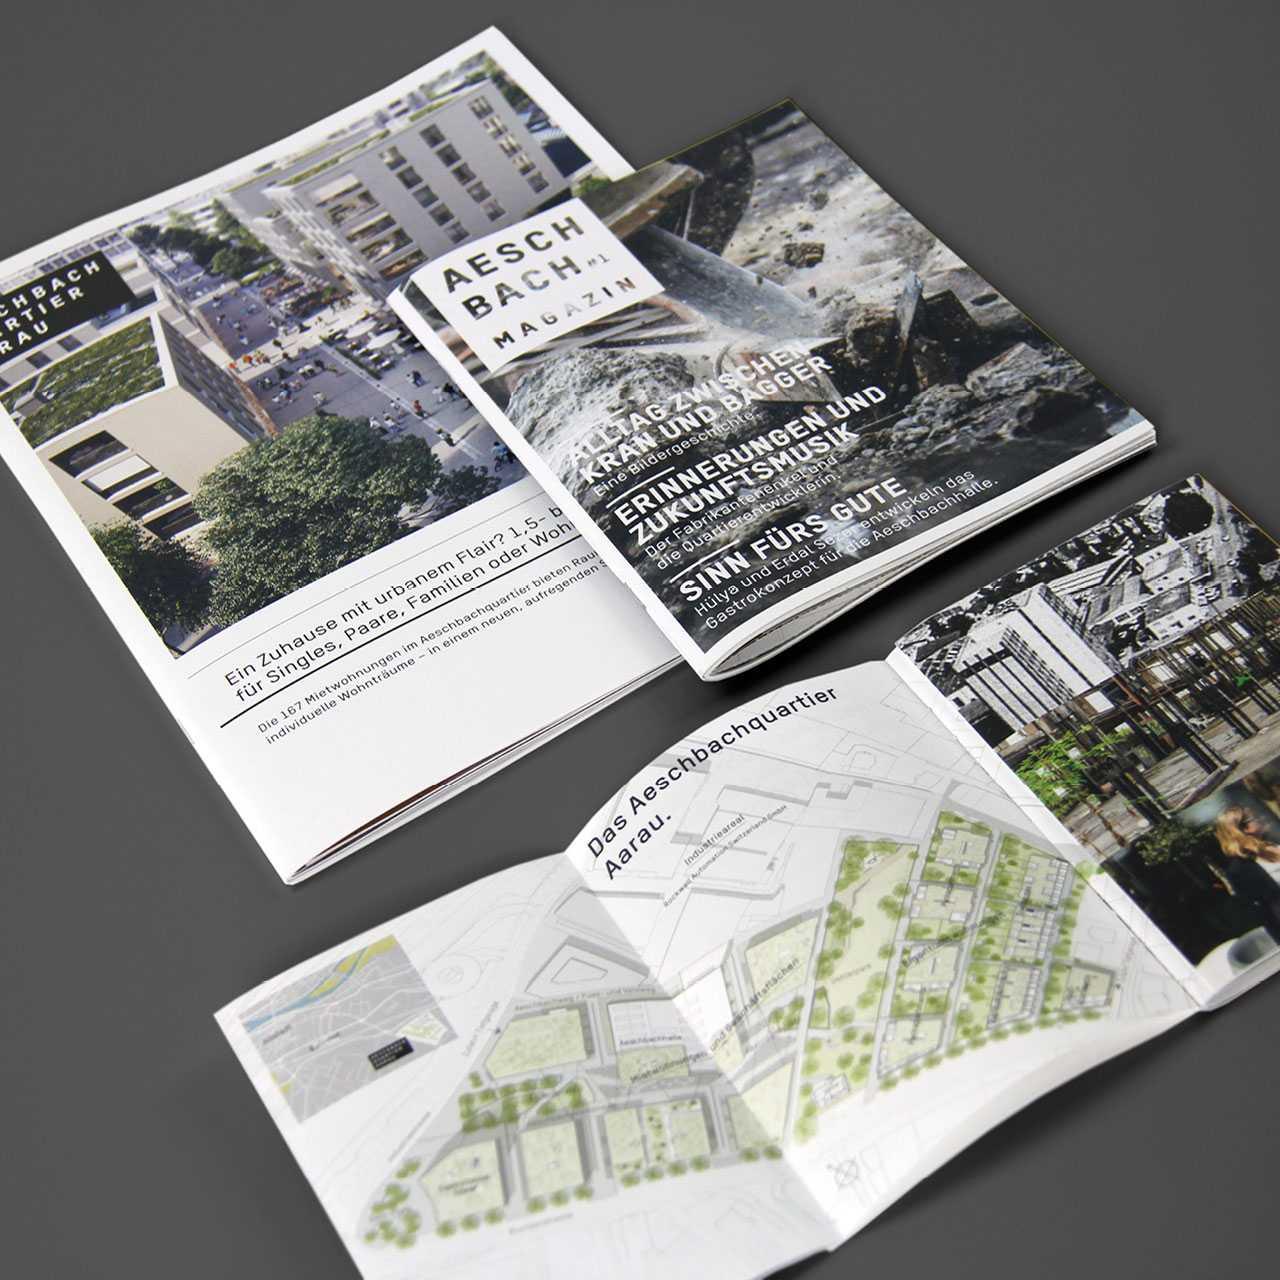 Aeschbachquartier Aarau by Mobimo AG: Printprodukte, Aeschbachmagazin